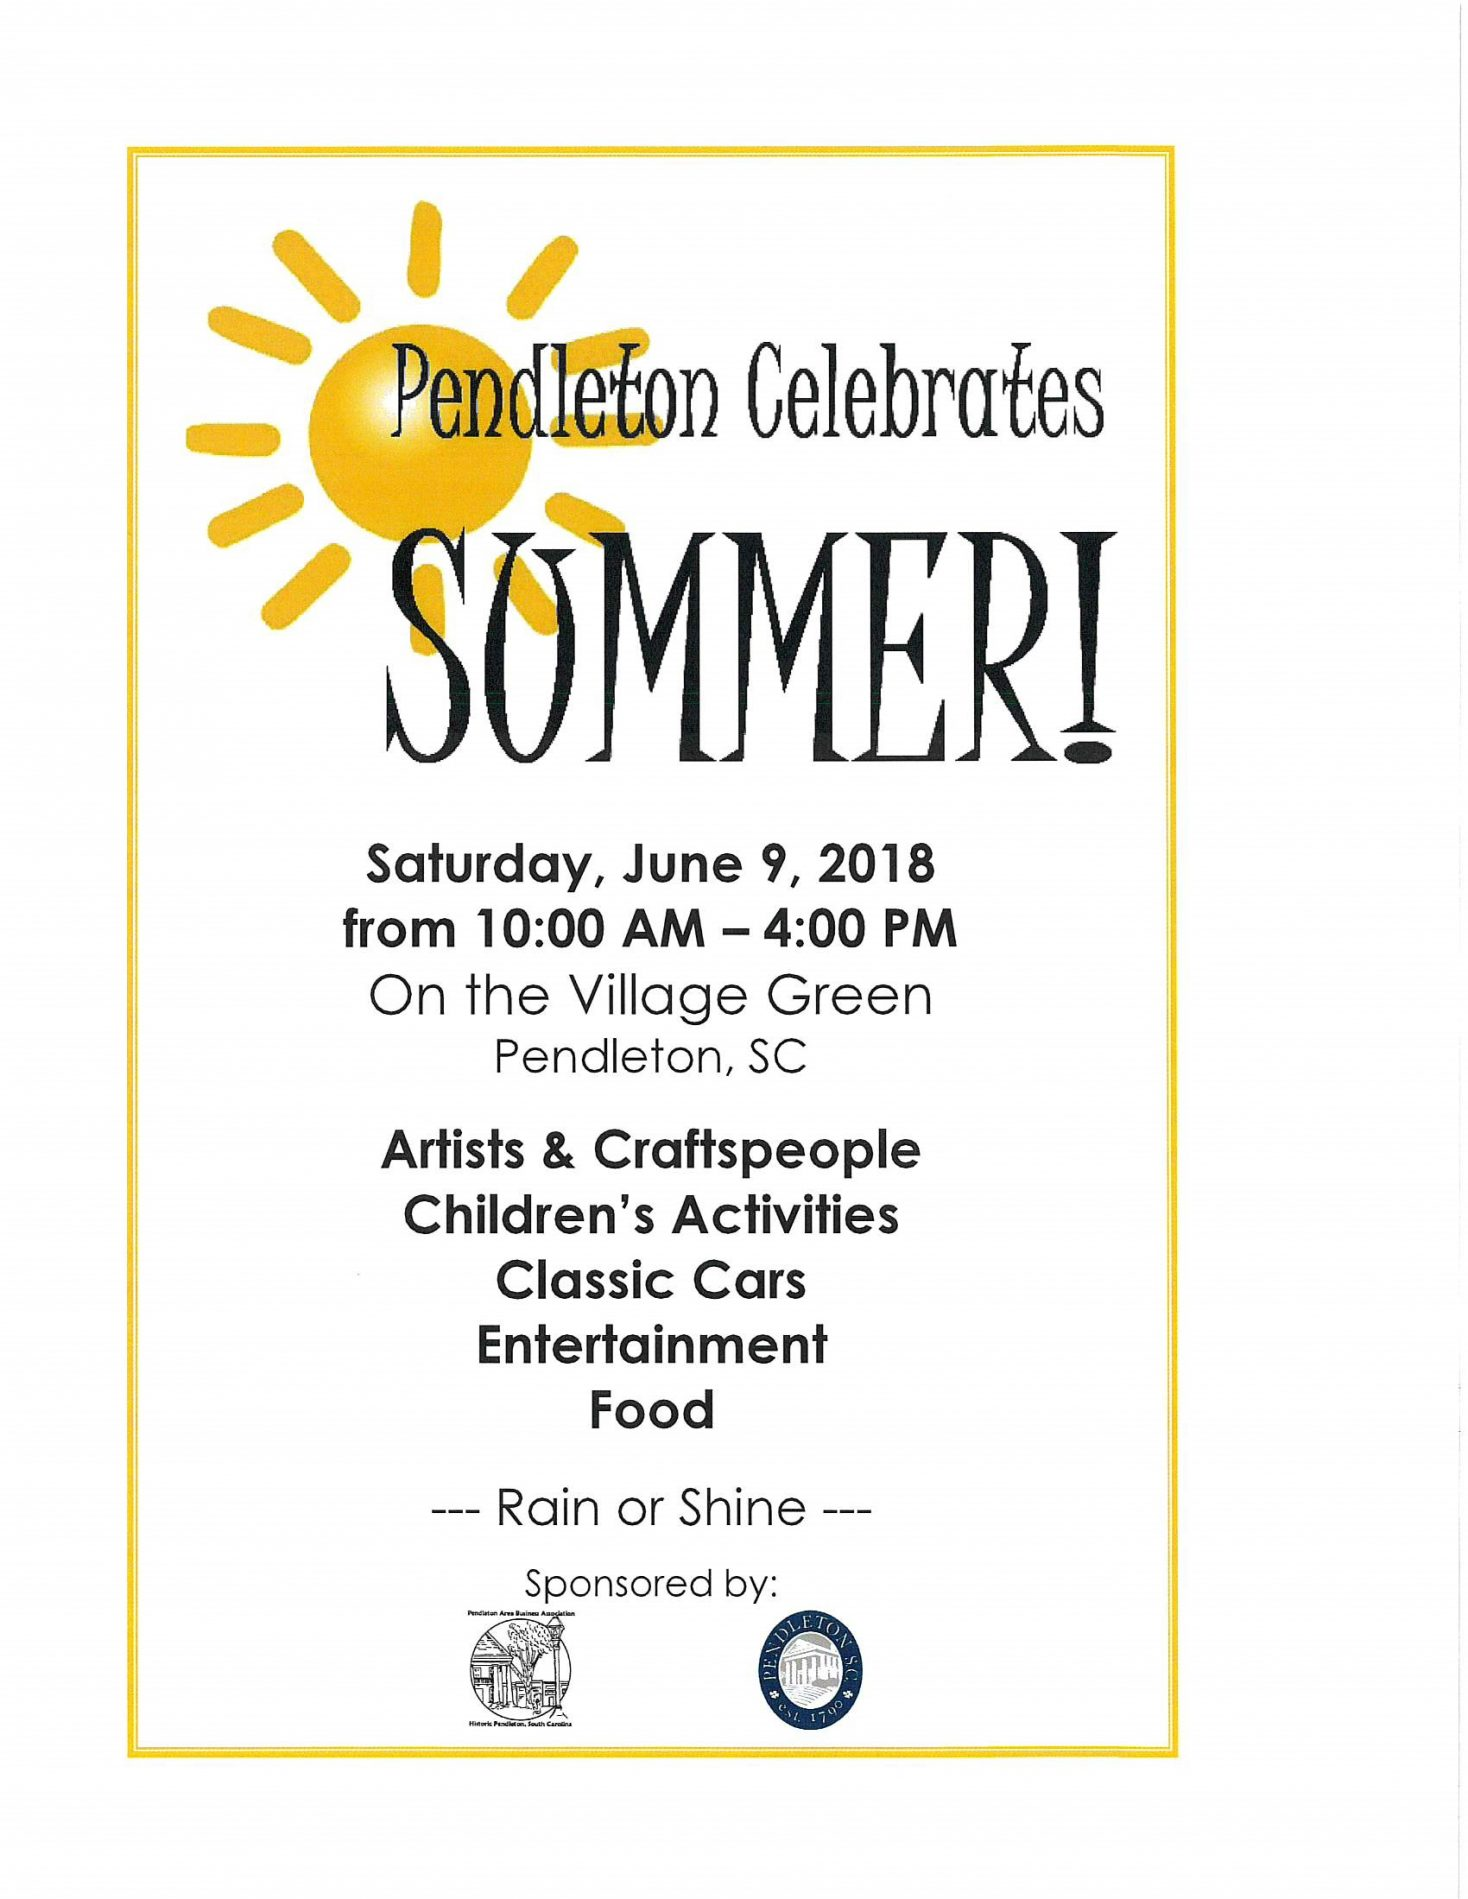 Pendleton Celebrates Summer